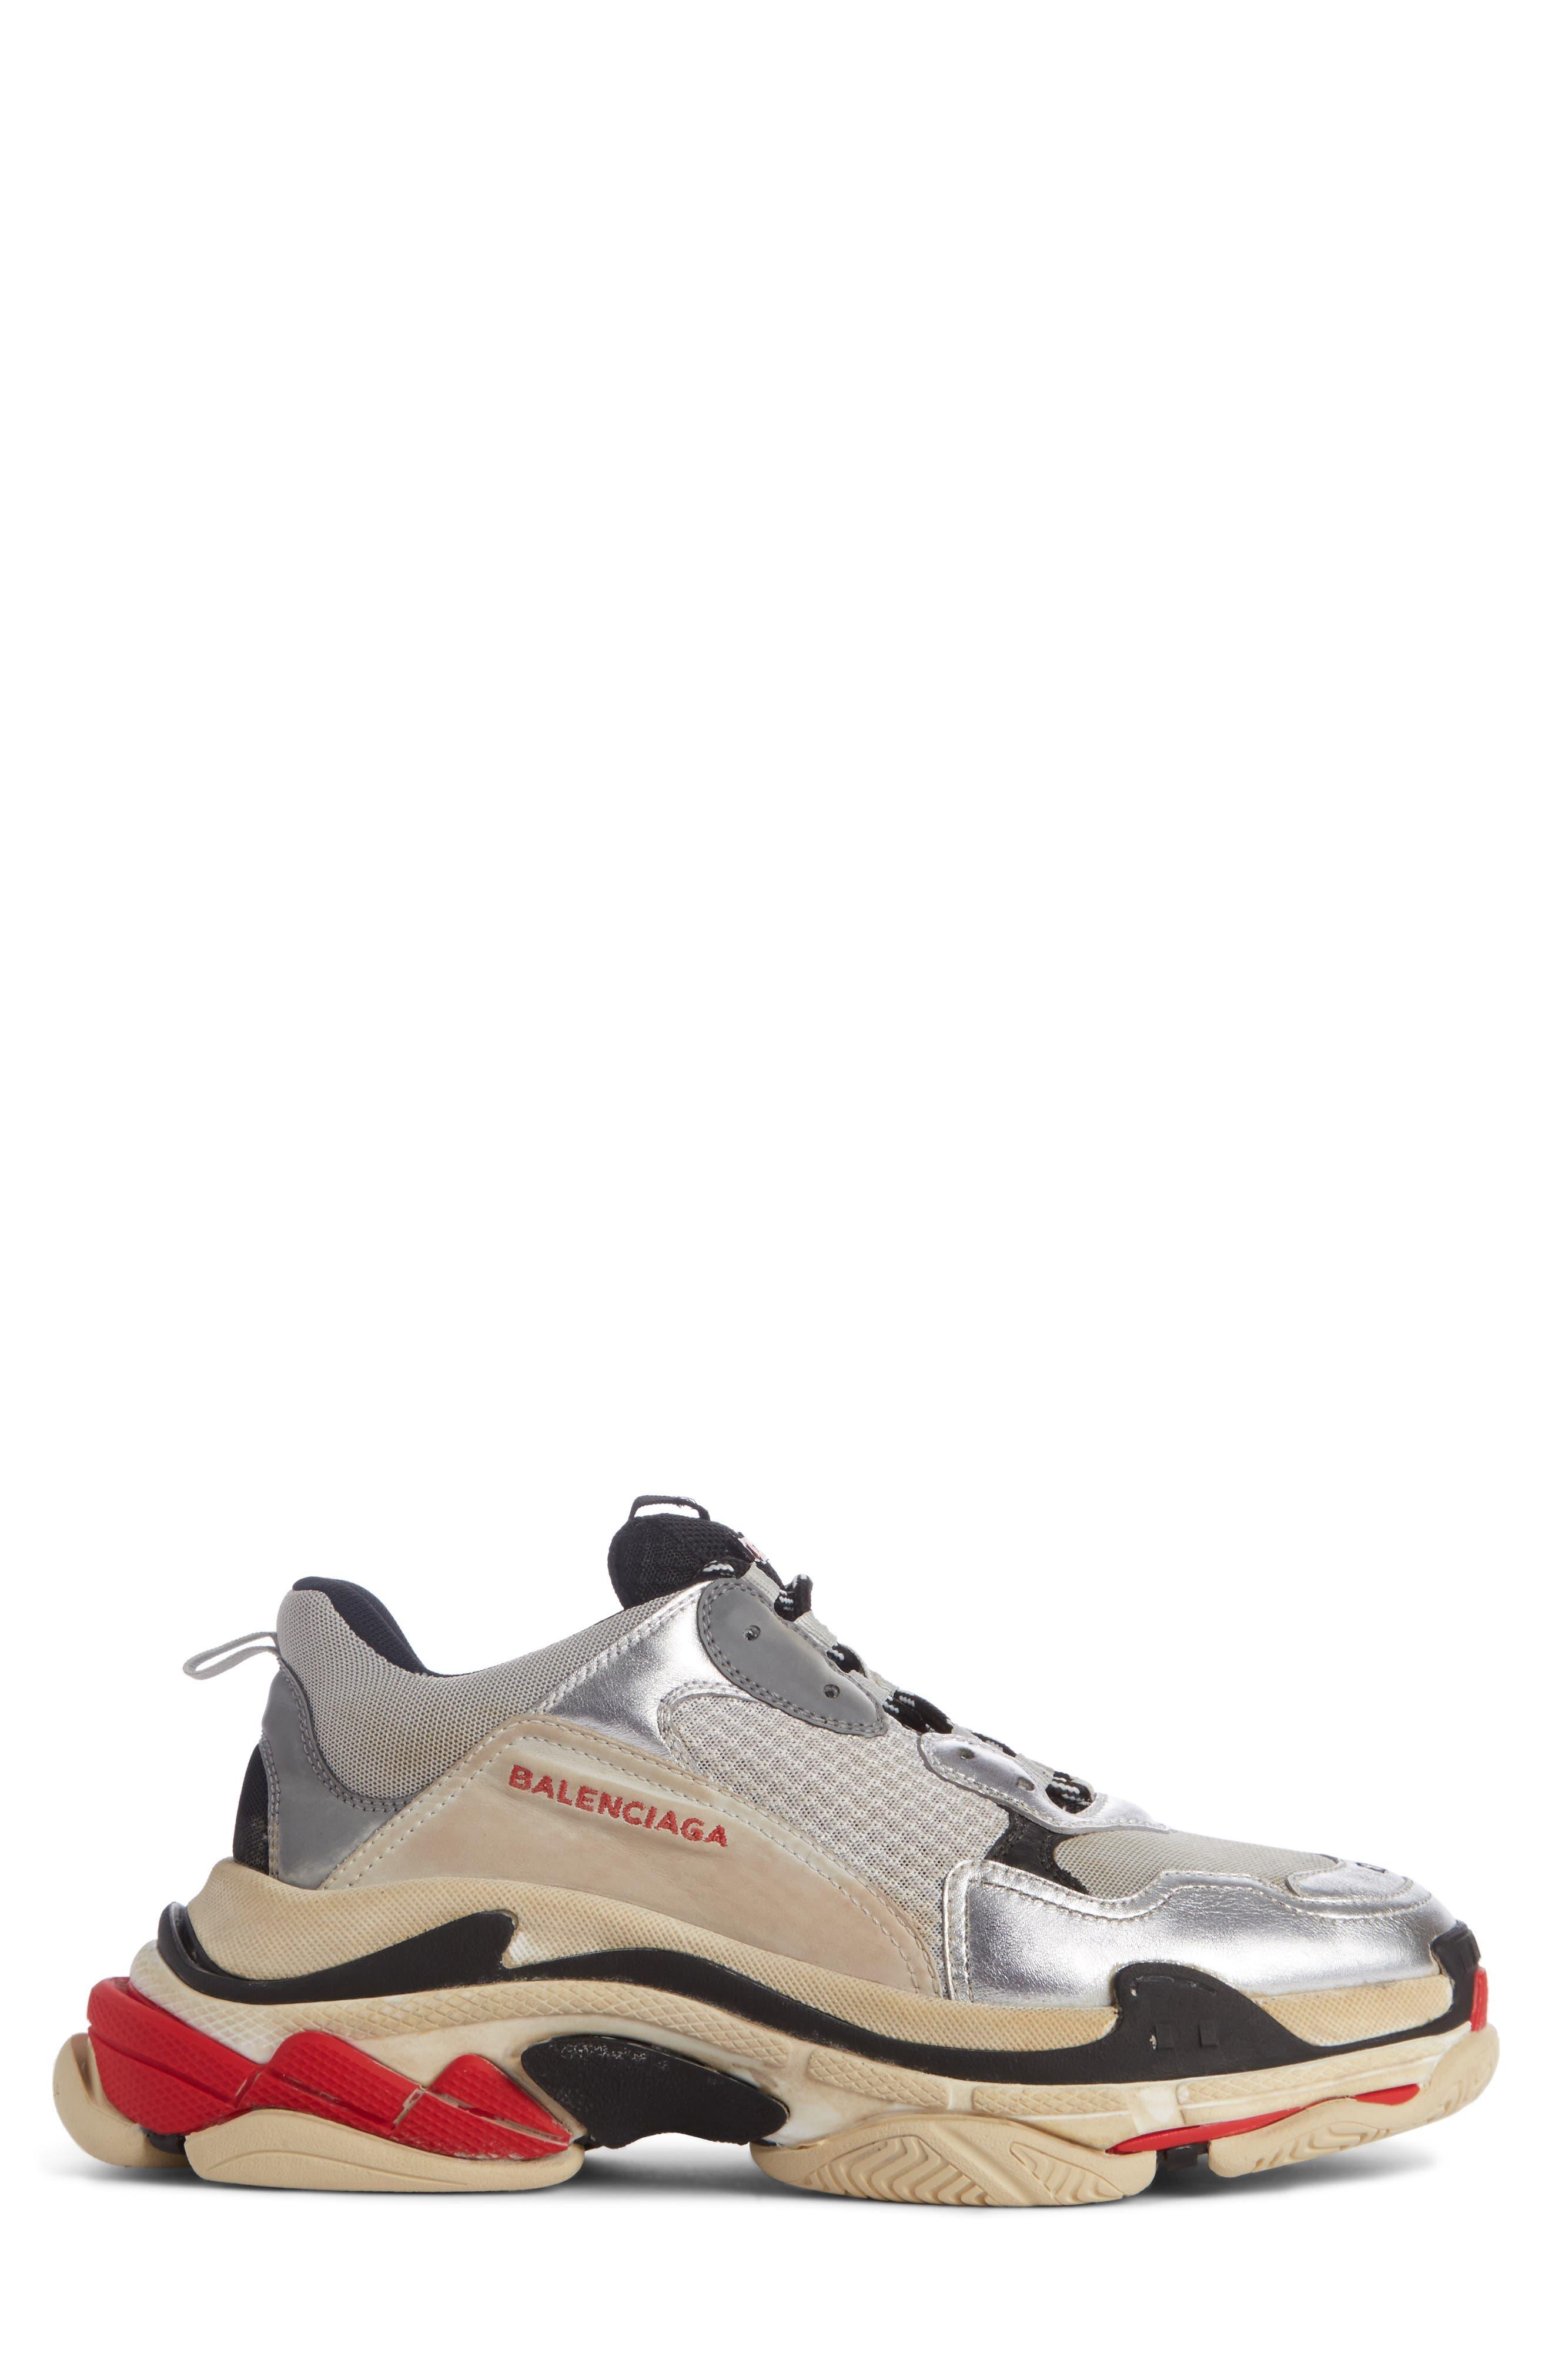 Alternate Image 3  - Balenciaga Triple S Retro Sneaker (Men)